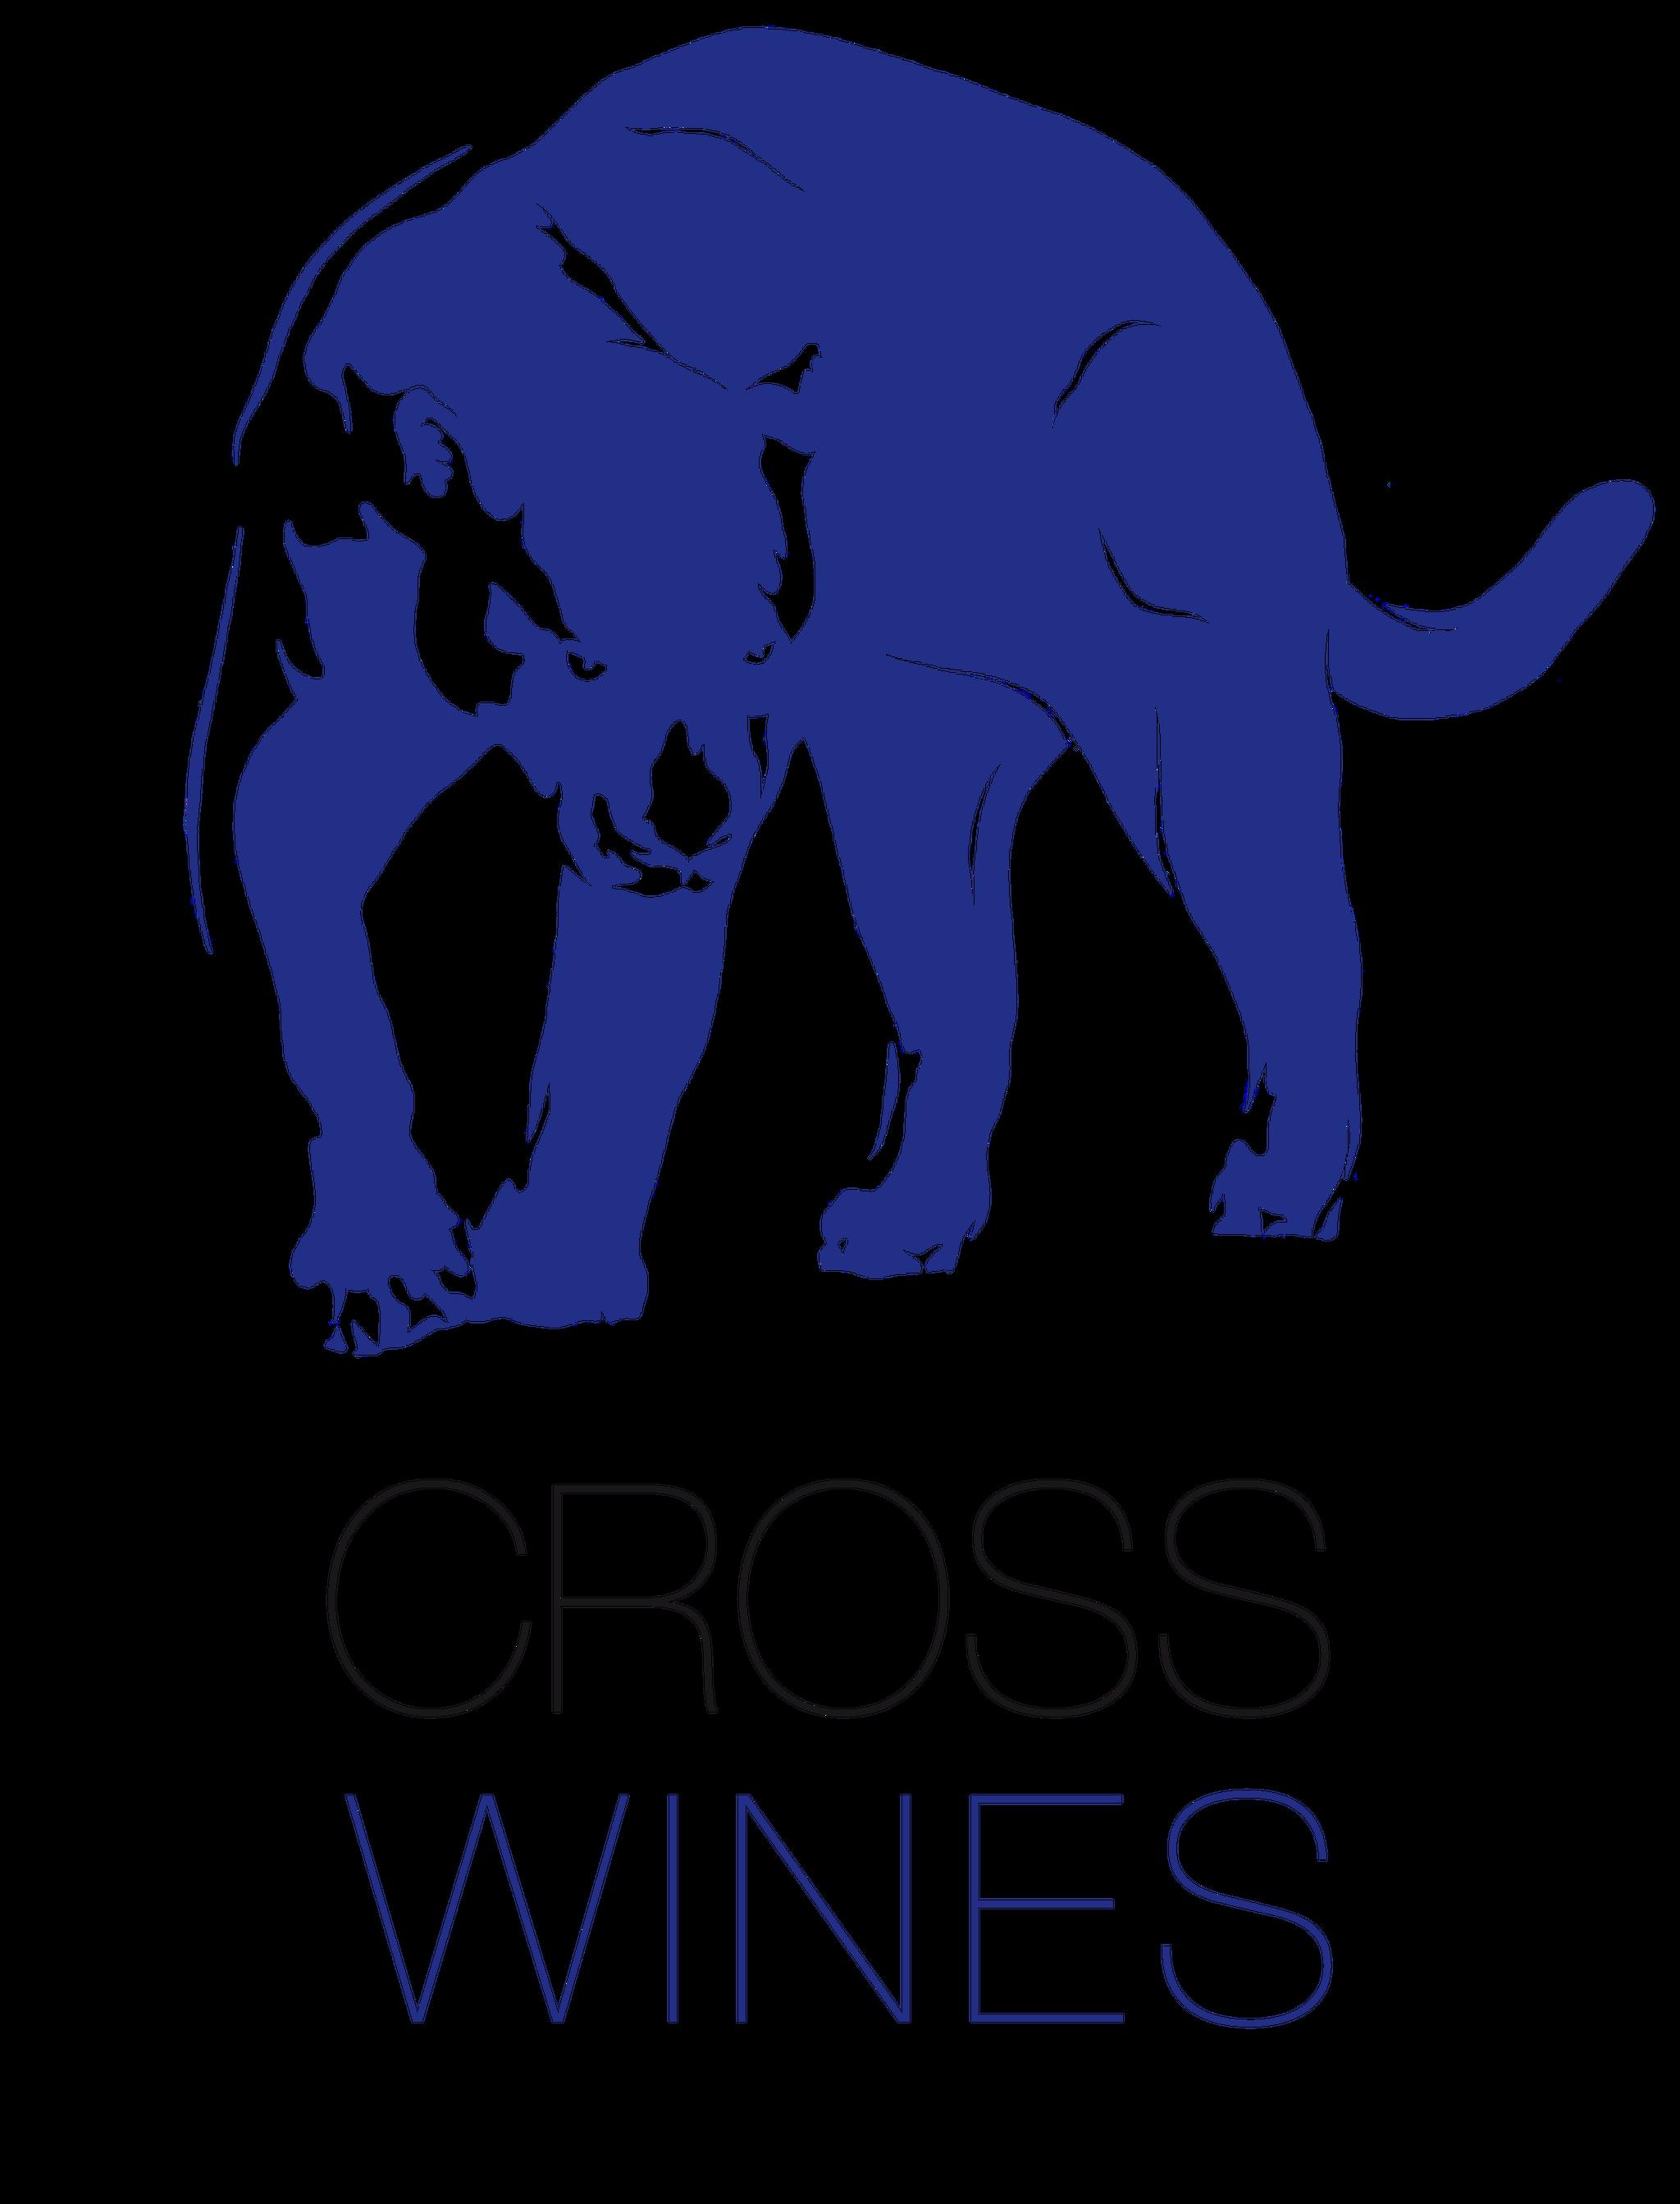 CROSS WINES CLUB